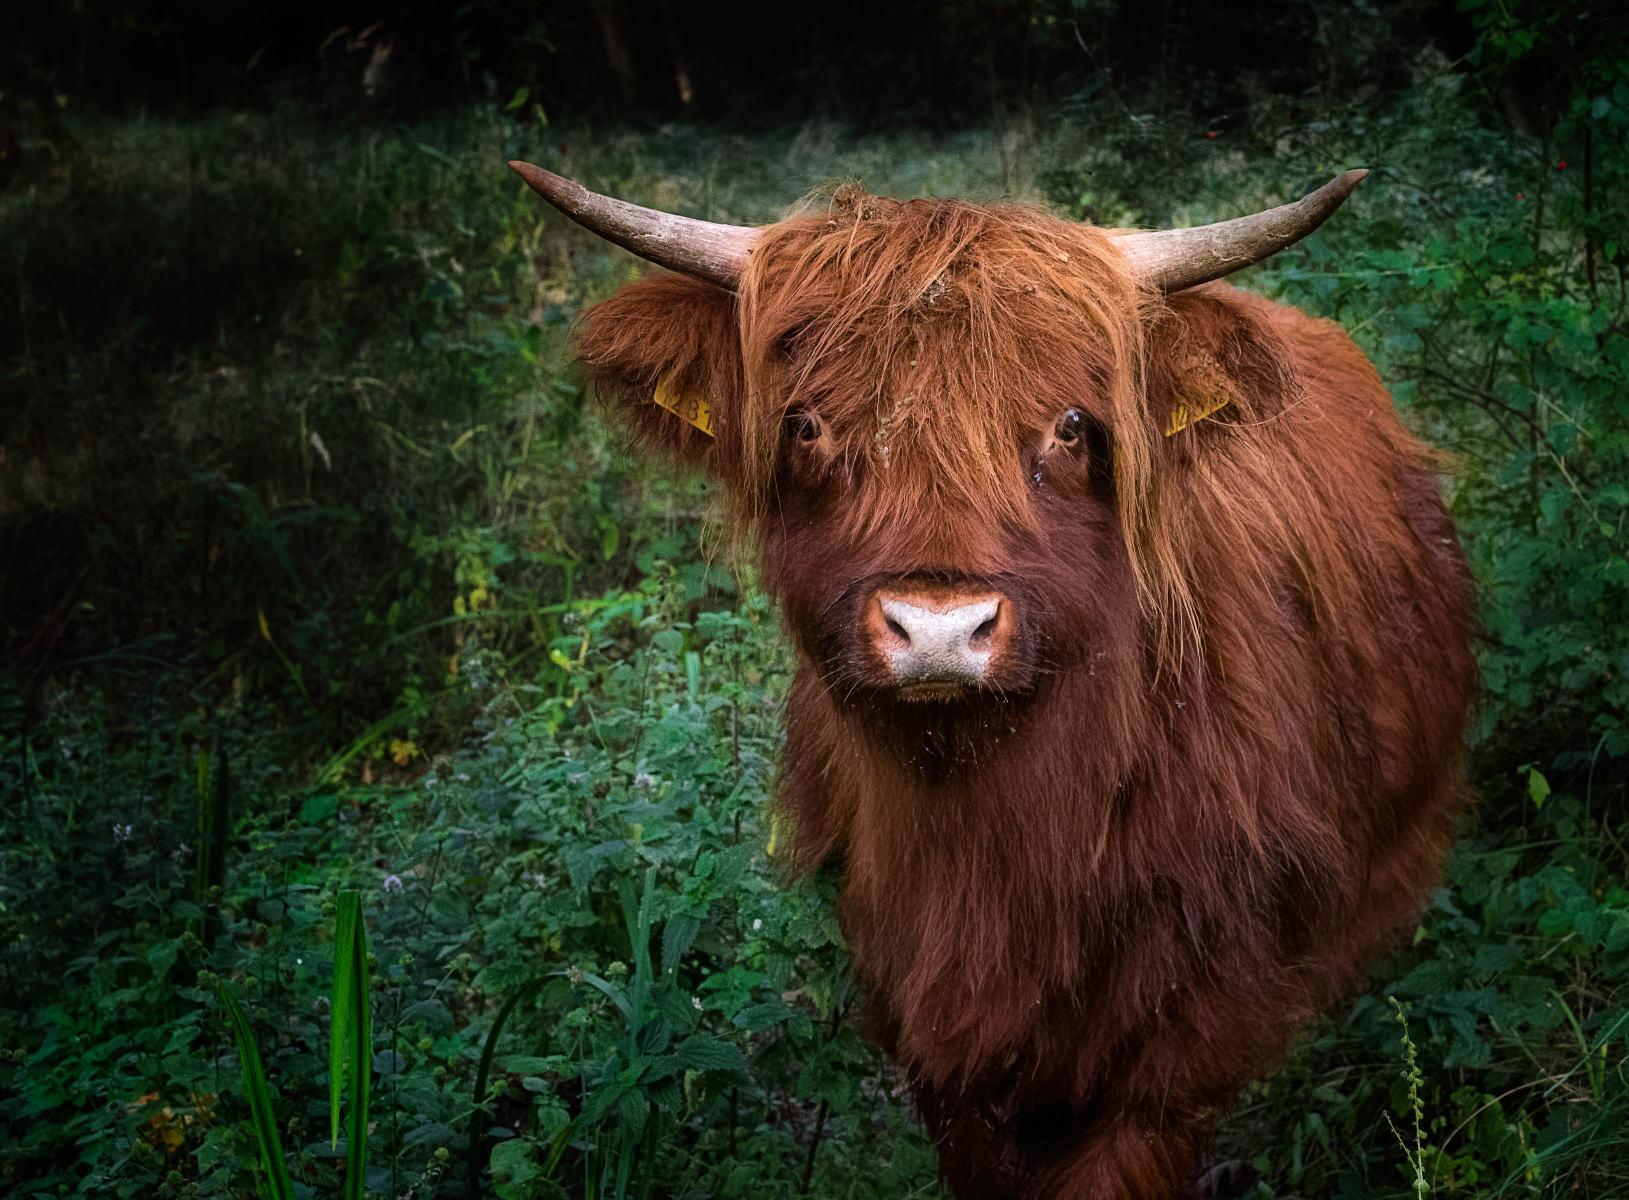 highland yearling amid lush greenery